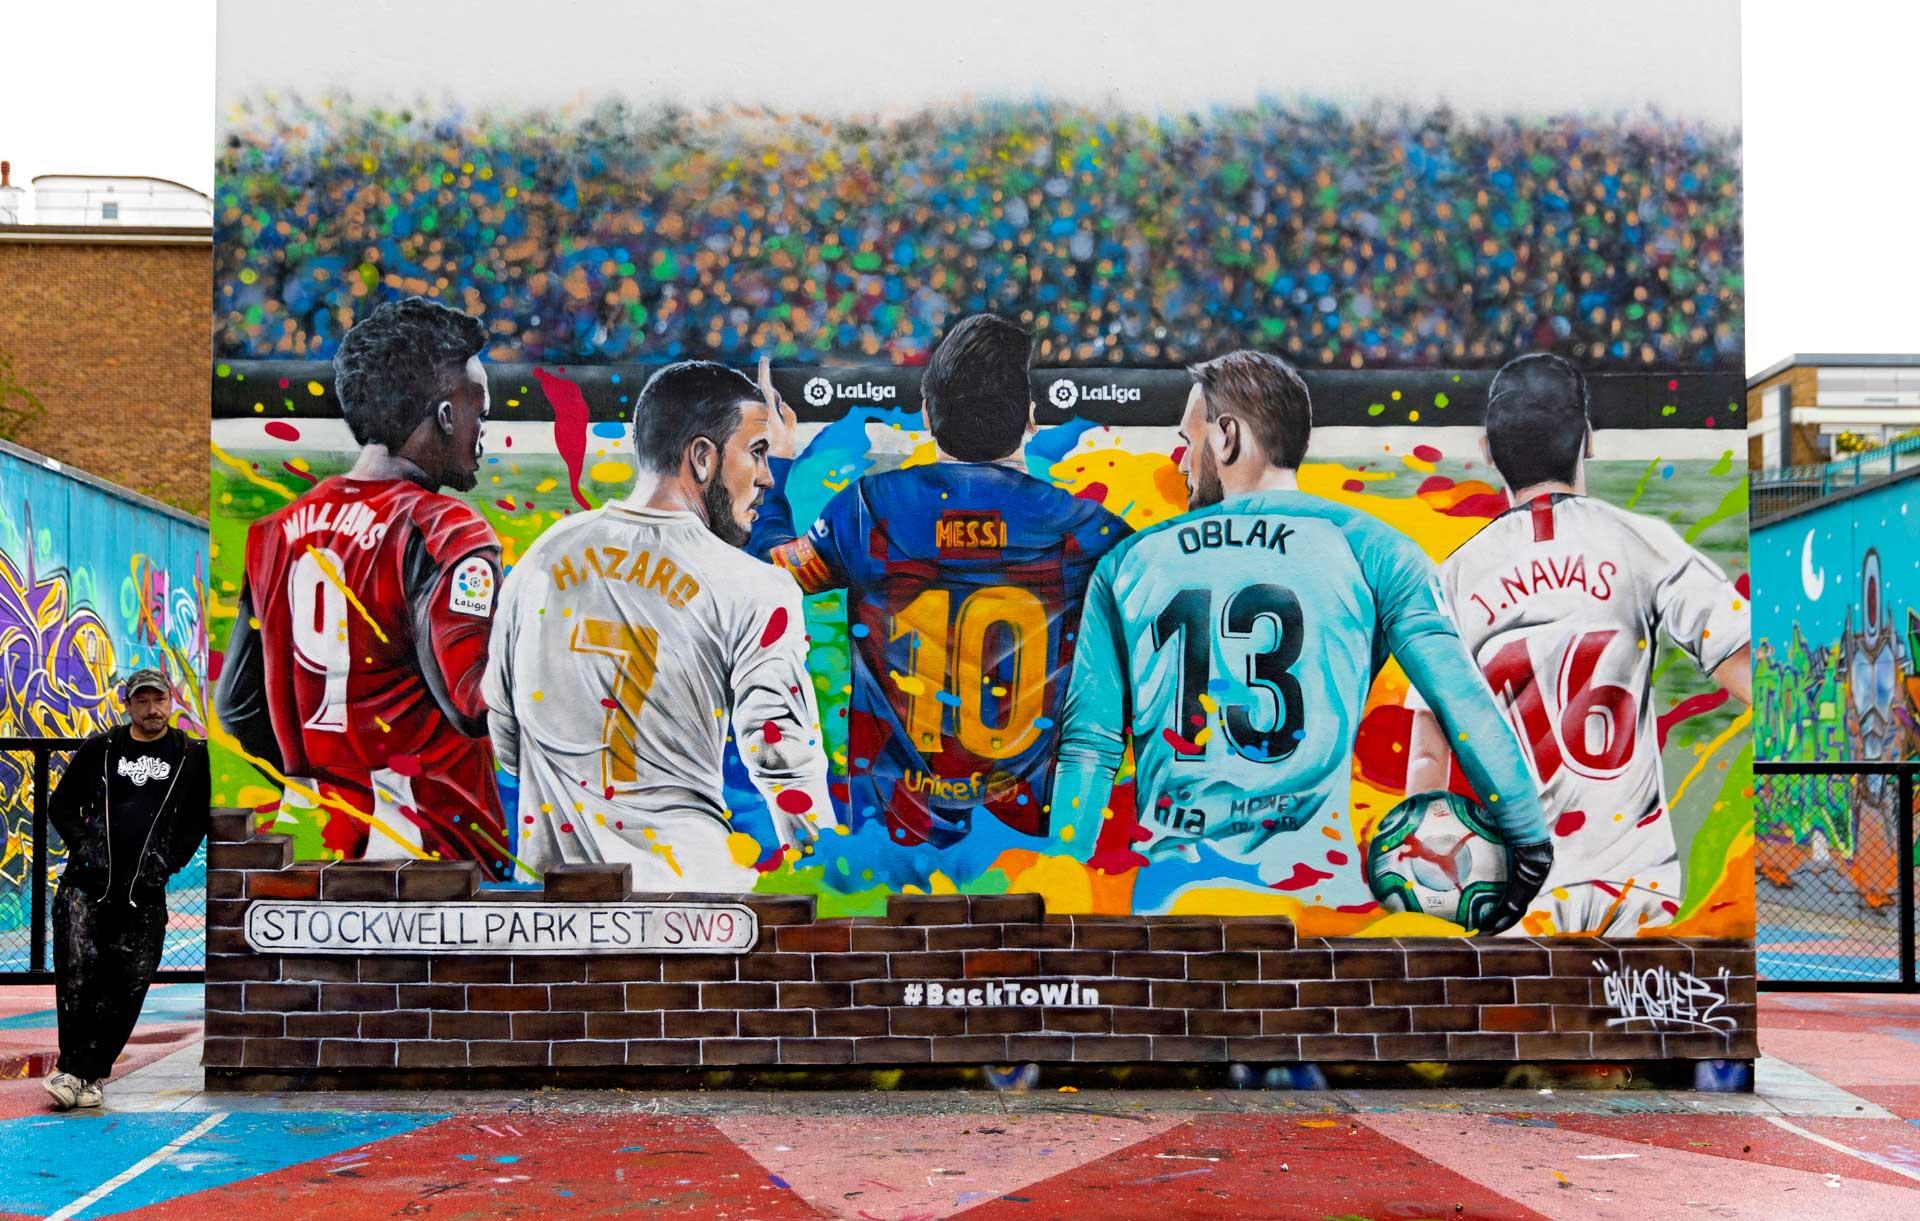 133-Laliga-football wall mural-large street art